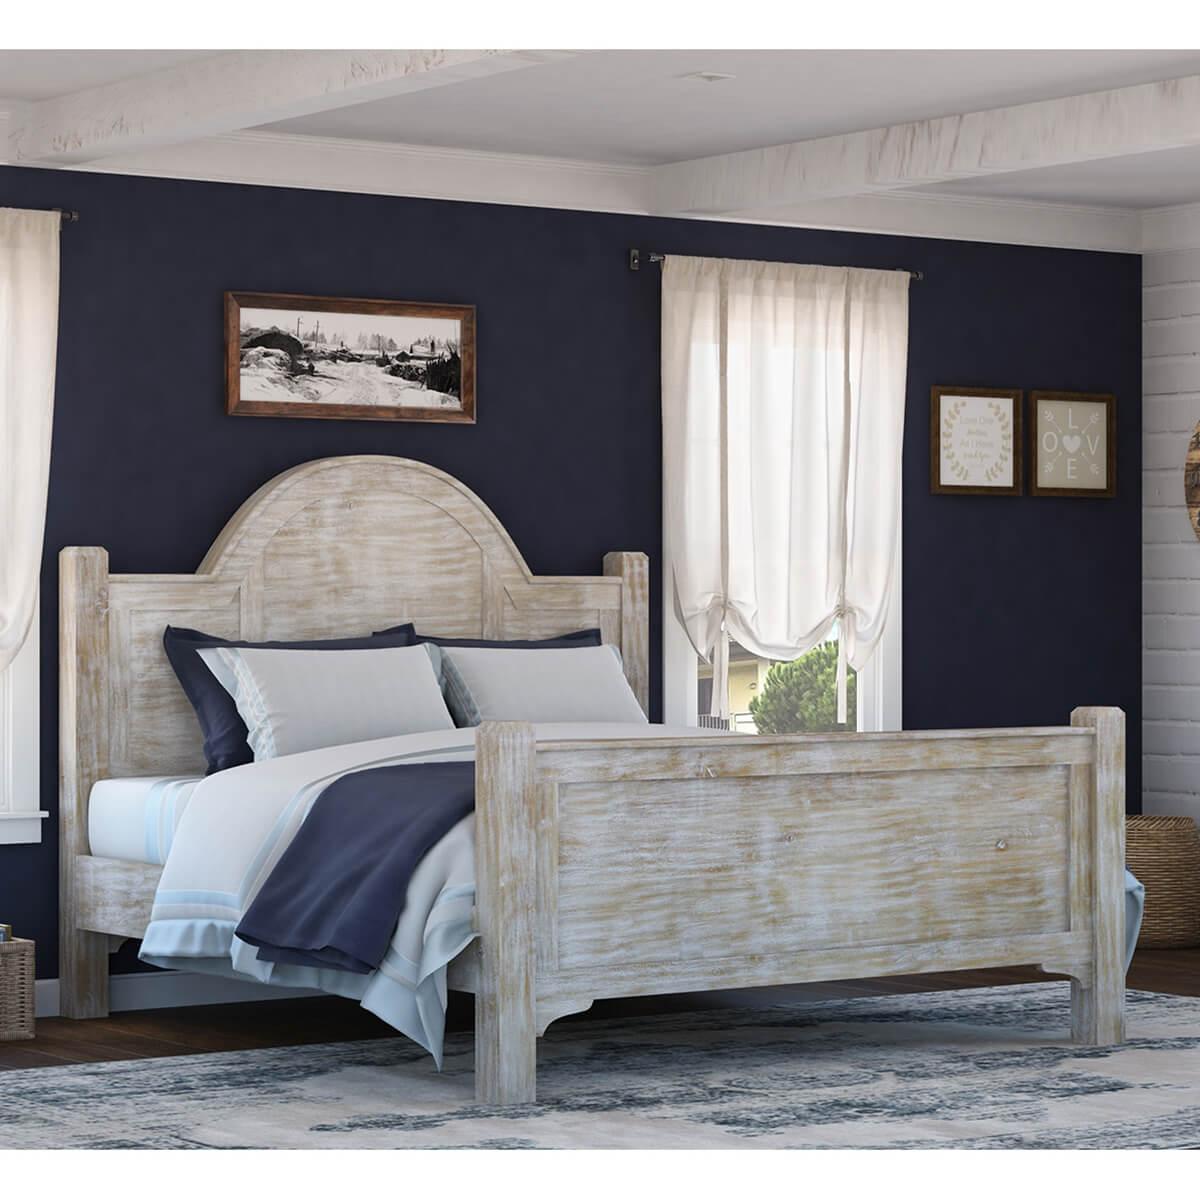 Gothic Rustic Winter White Mango Wood Platform Bed w Foot & Headboard